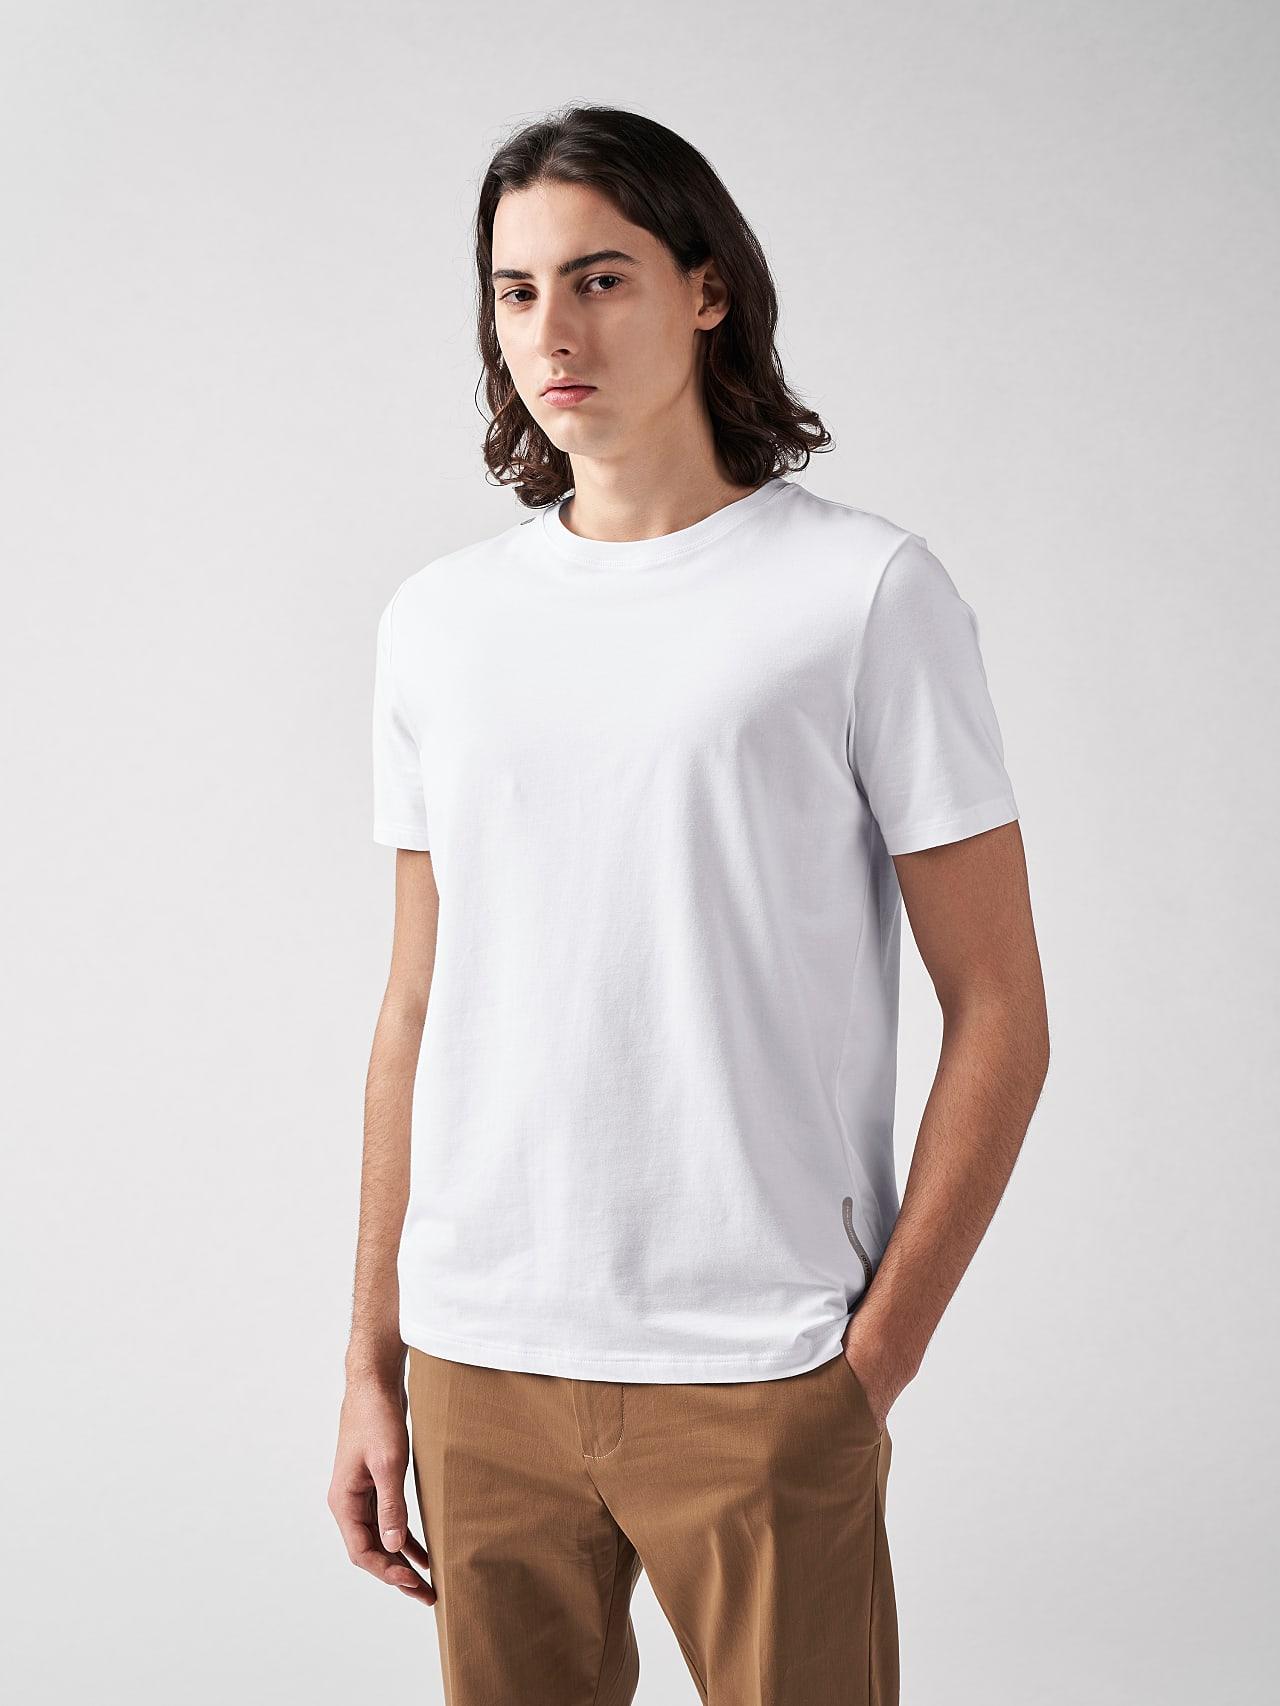 JALIP V1.Y5.01 Cotton Crew-Neck T-Shirt white Front Main Alpha Tauri